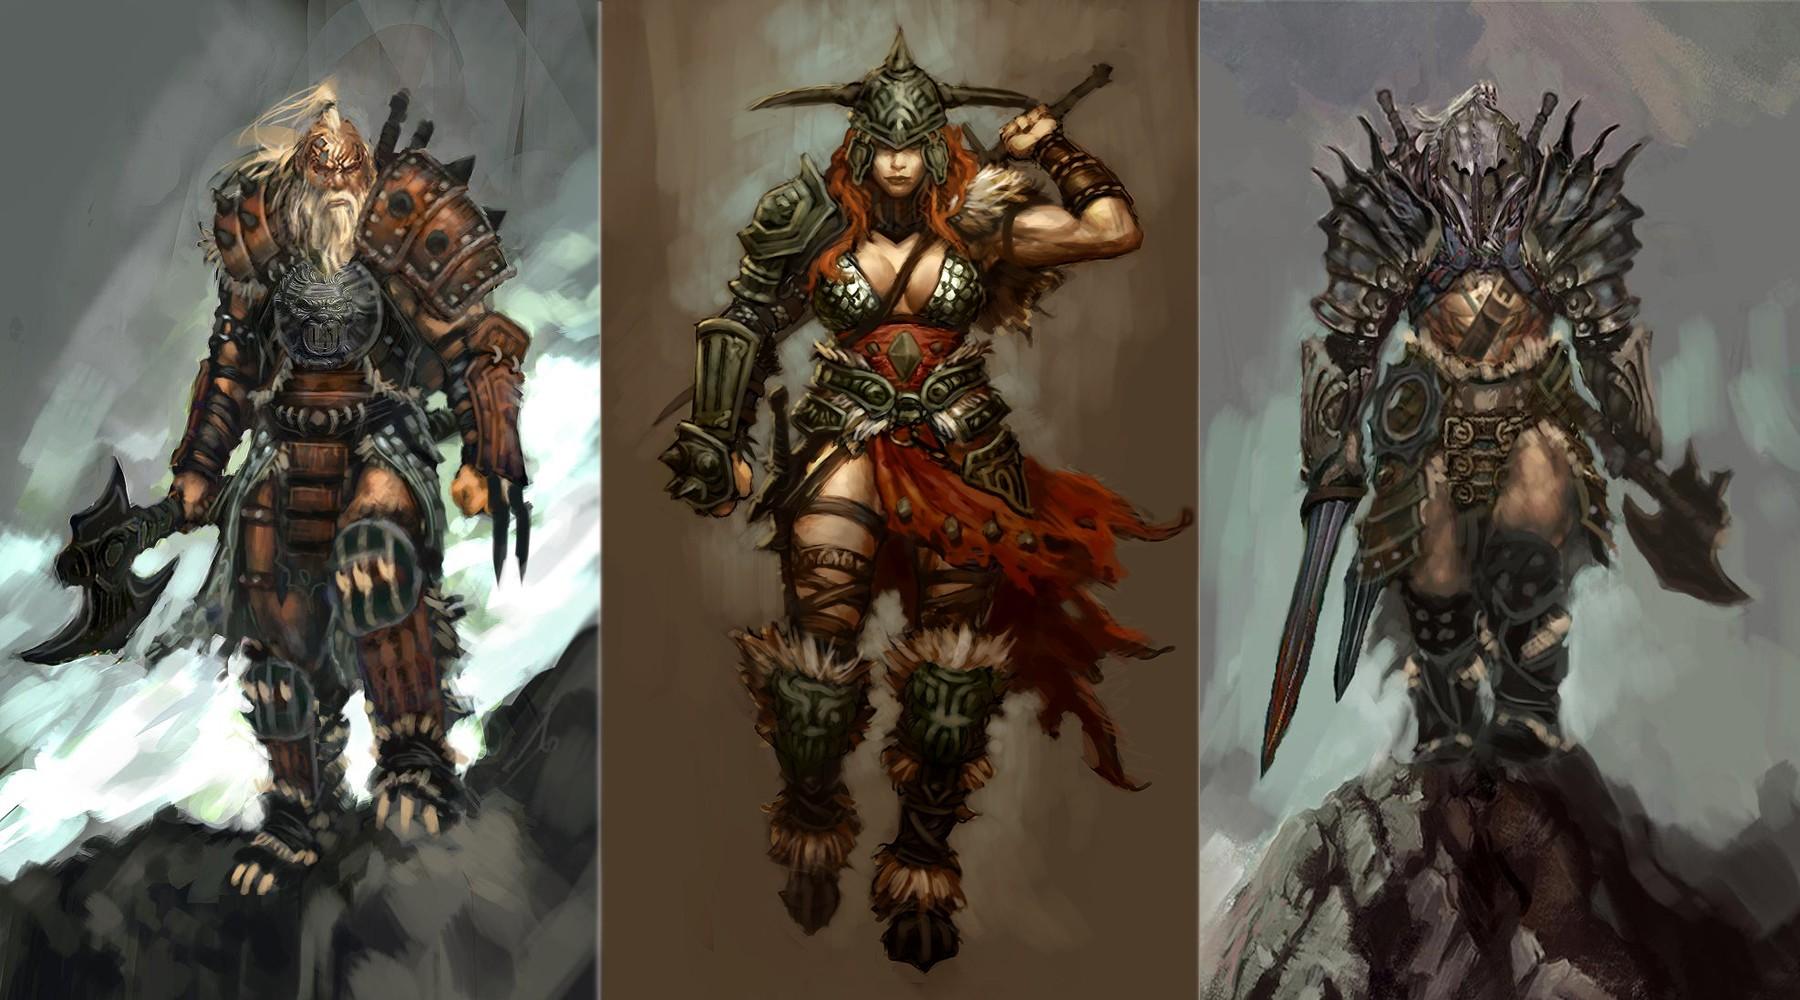 Download Diablo Barbarian Wallpaper 1800x1000 Wallpoper 1800x1000